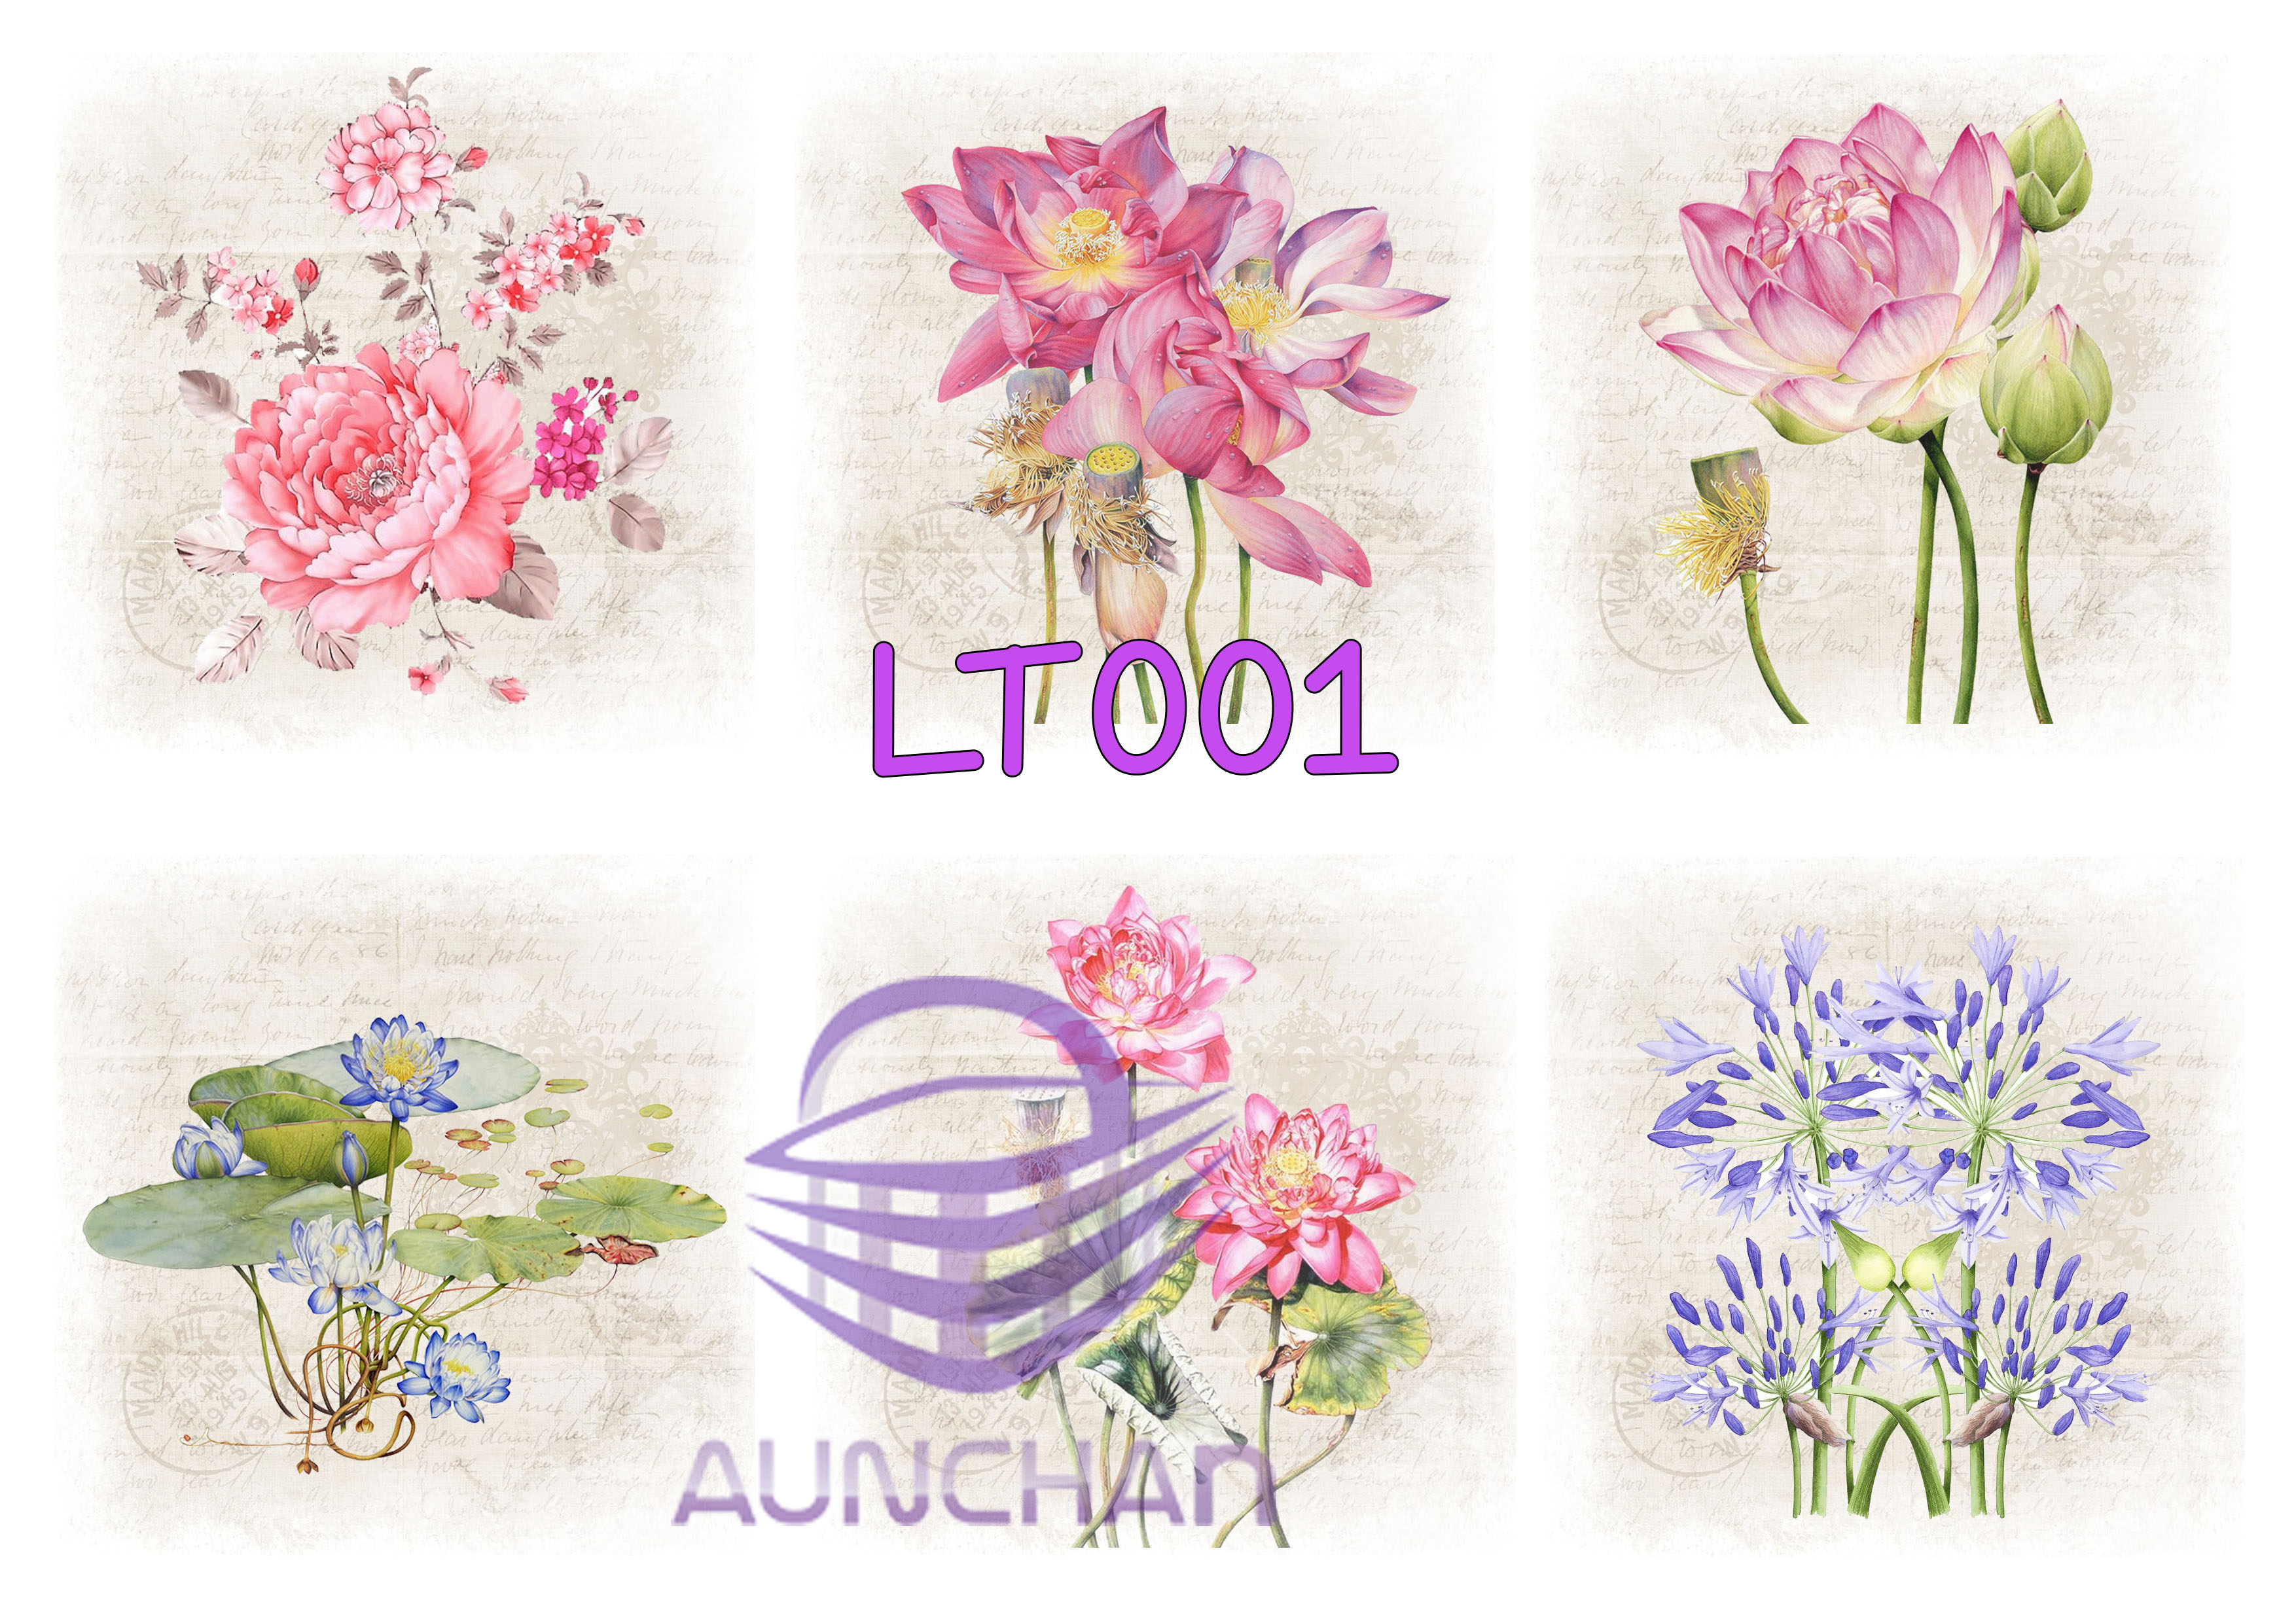 LT001 กระดาษแนพกิ้น 21x30ซม. ลายดอกบัว